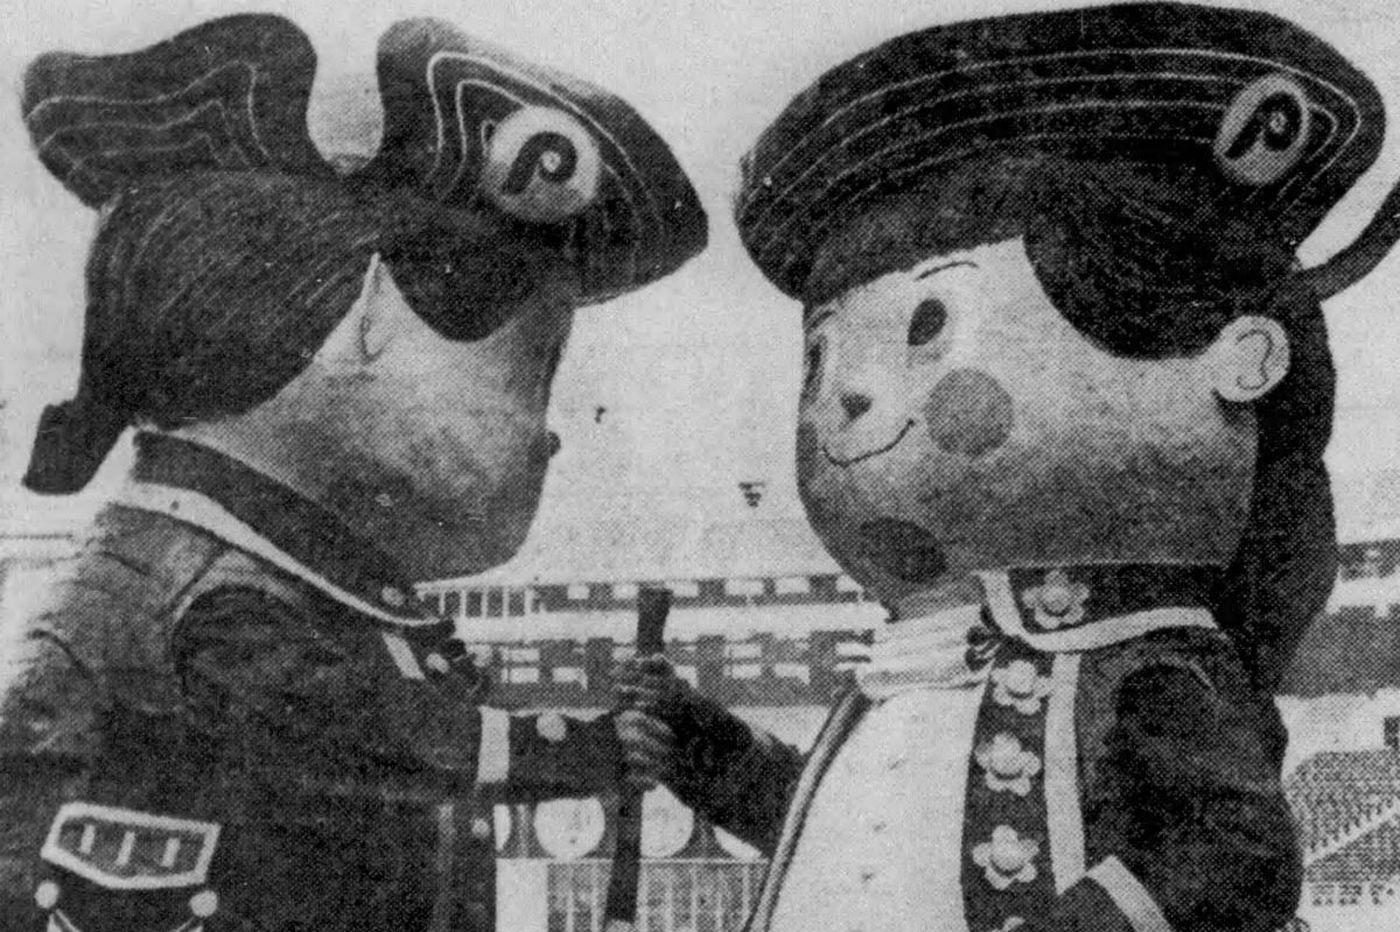 Before the Phanatic, the Phillies had animatronic twins